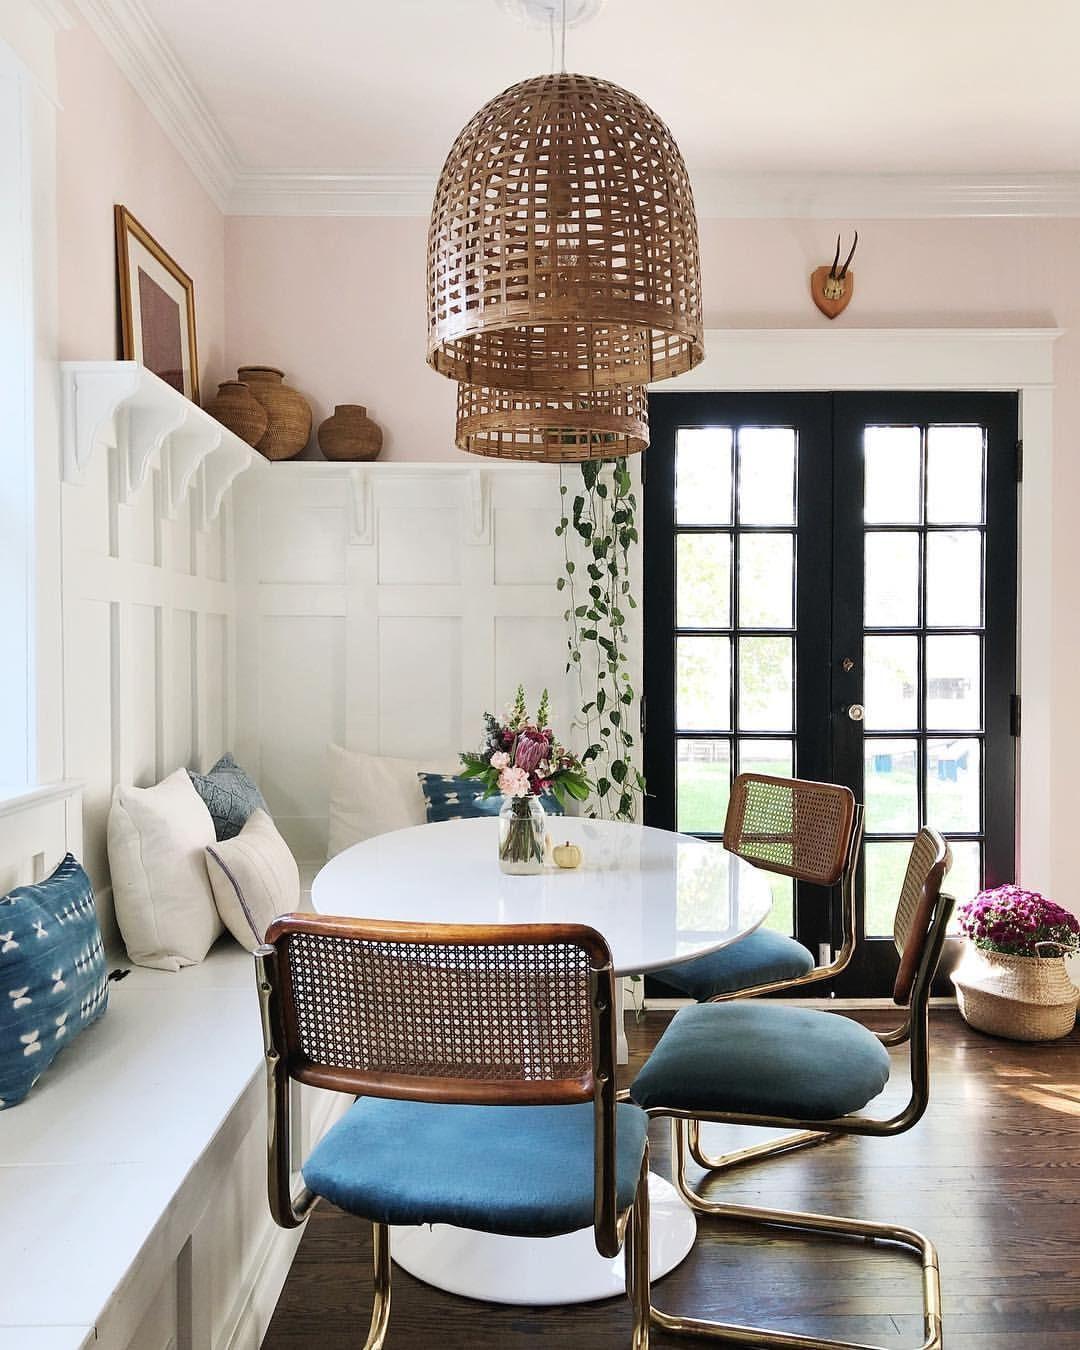 Best Breakfast Nook Ideas With Round Table Bestbreakfastnookideas Dining Nook Dining Room Design Dining Room Inspiration